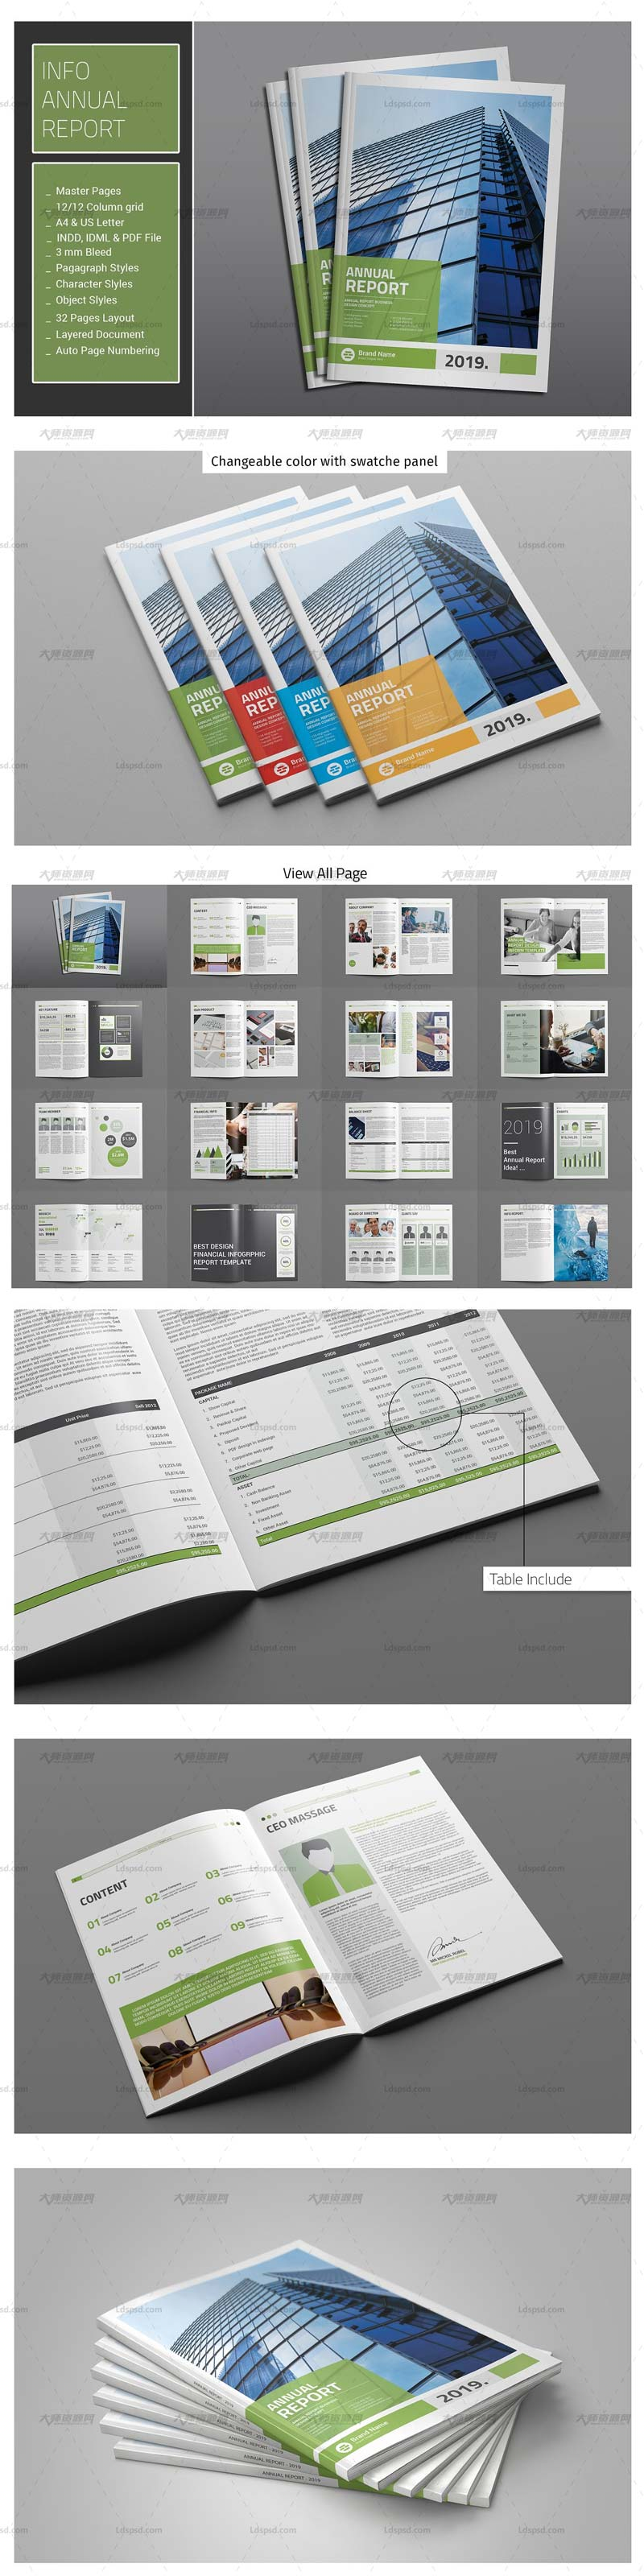 Info Annual Report.jpg